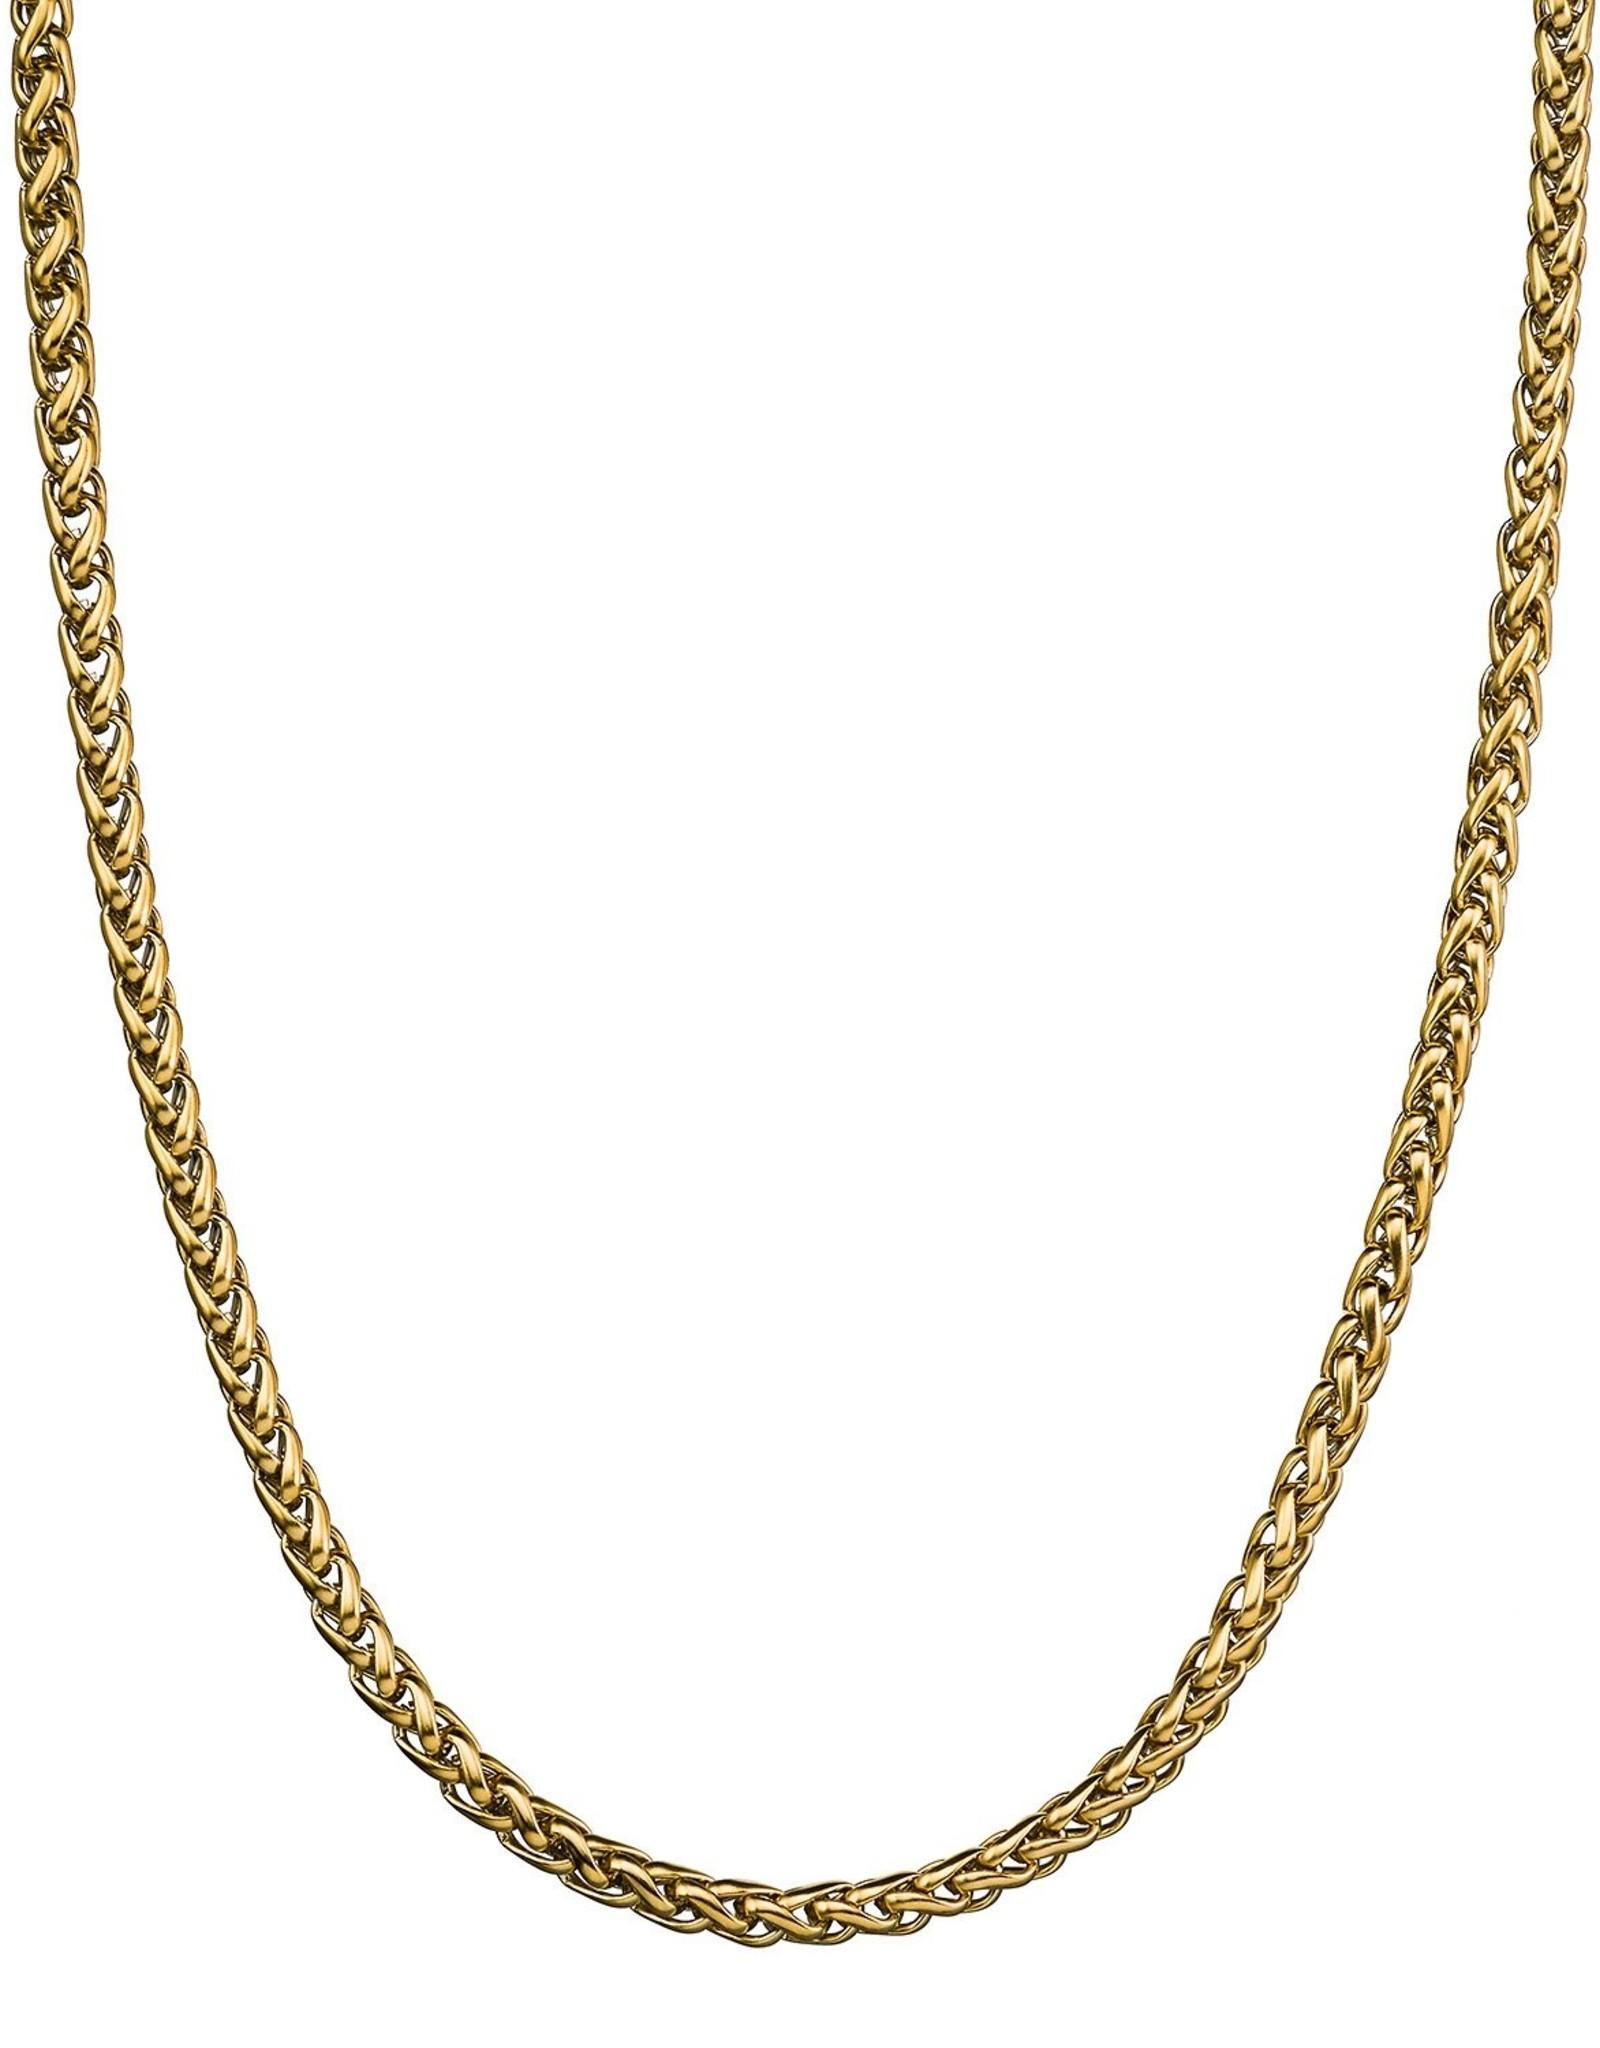 Croyez Chain wheat 5mm 14k gold 55cm